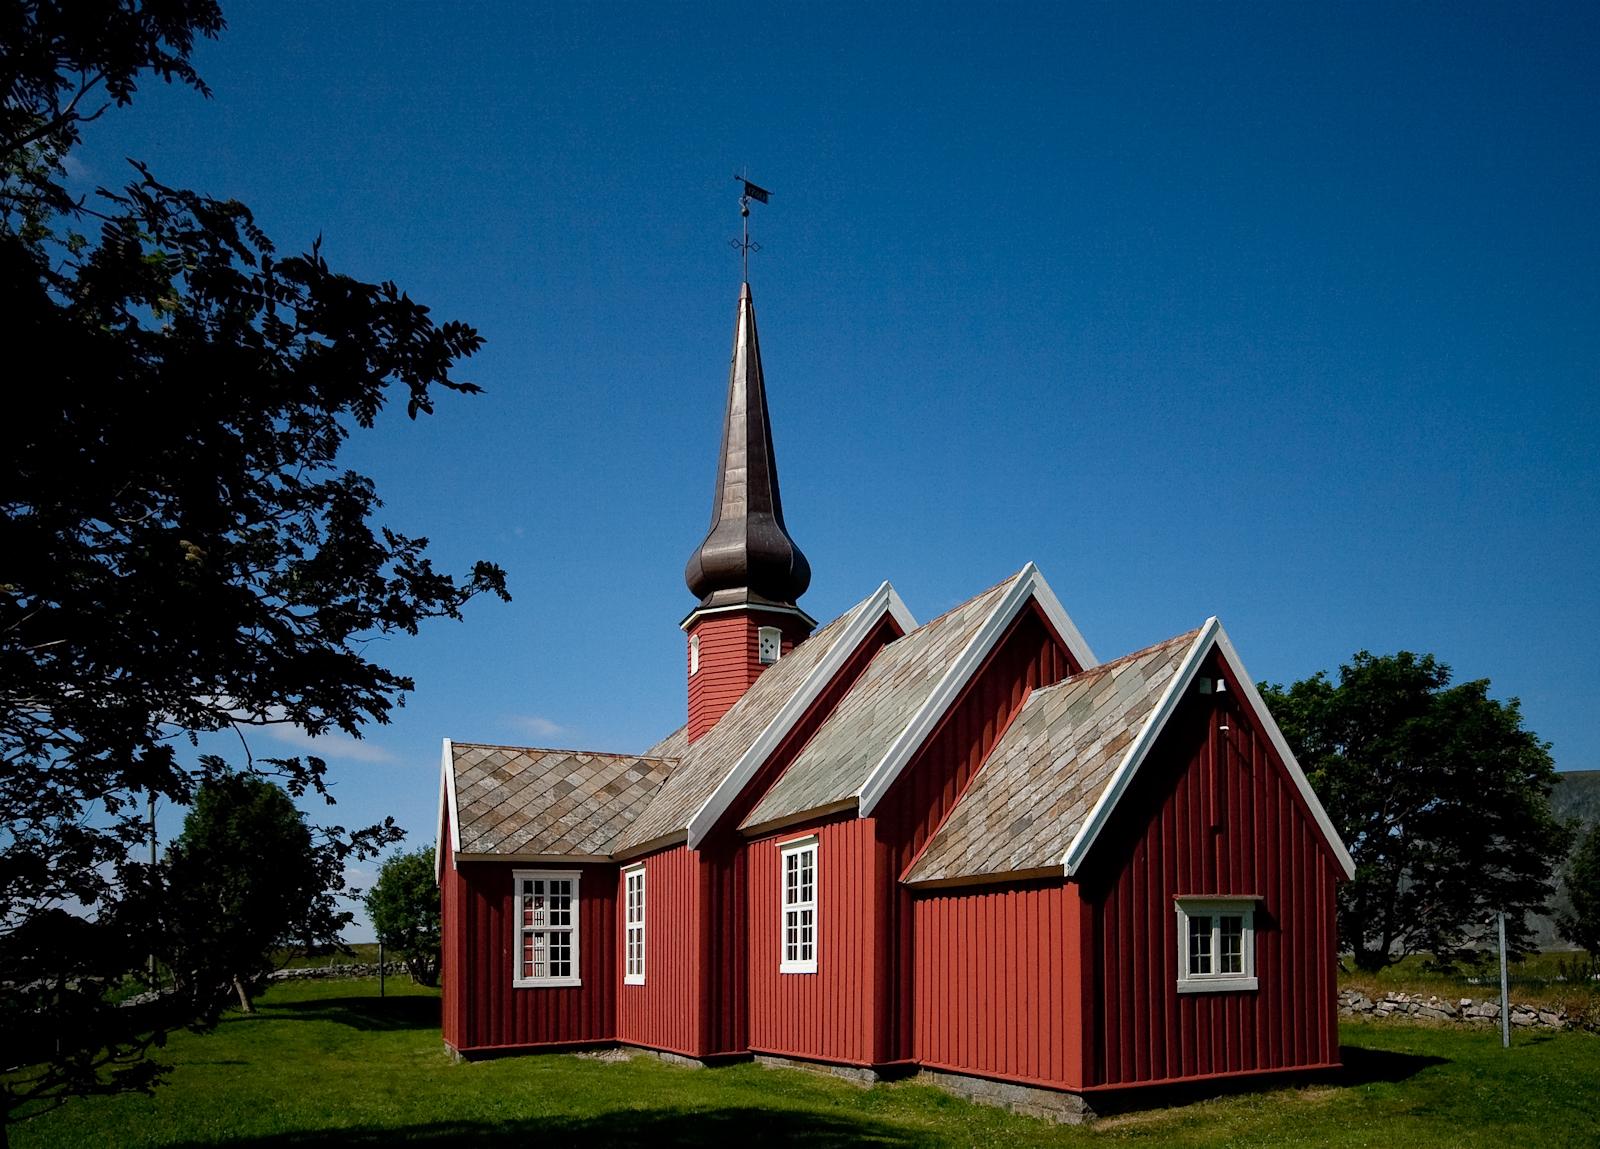 Flakstad Kirke dalla cupola a cipolla, costruita nel 1780.